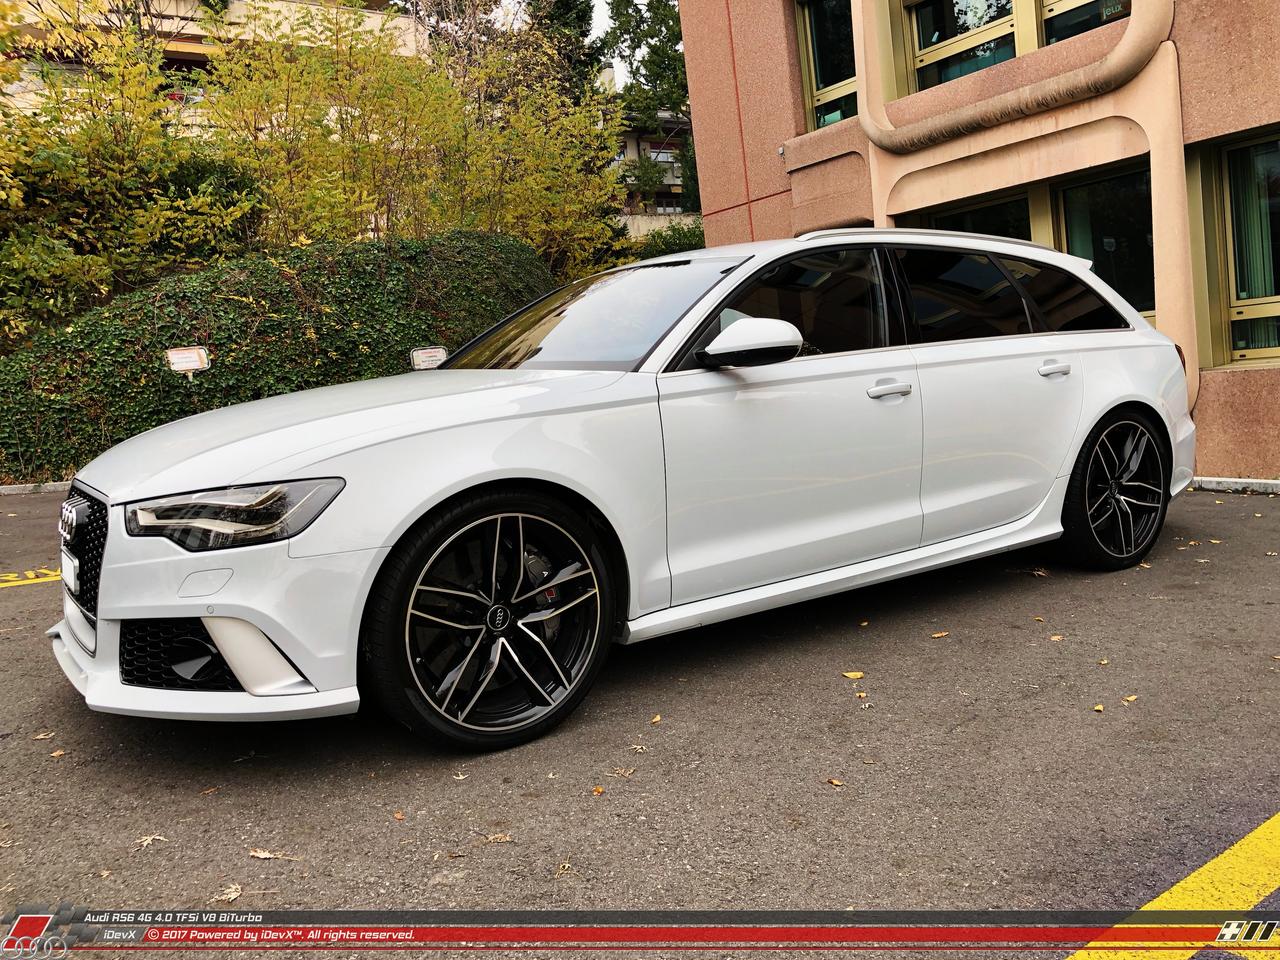 10_11.2018_Audi-RS6_iDevX_027.png